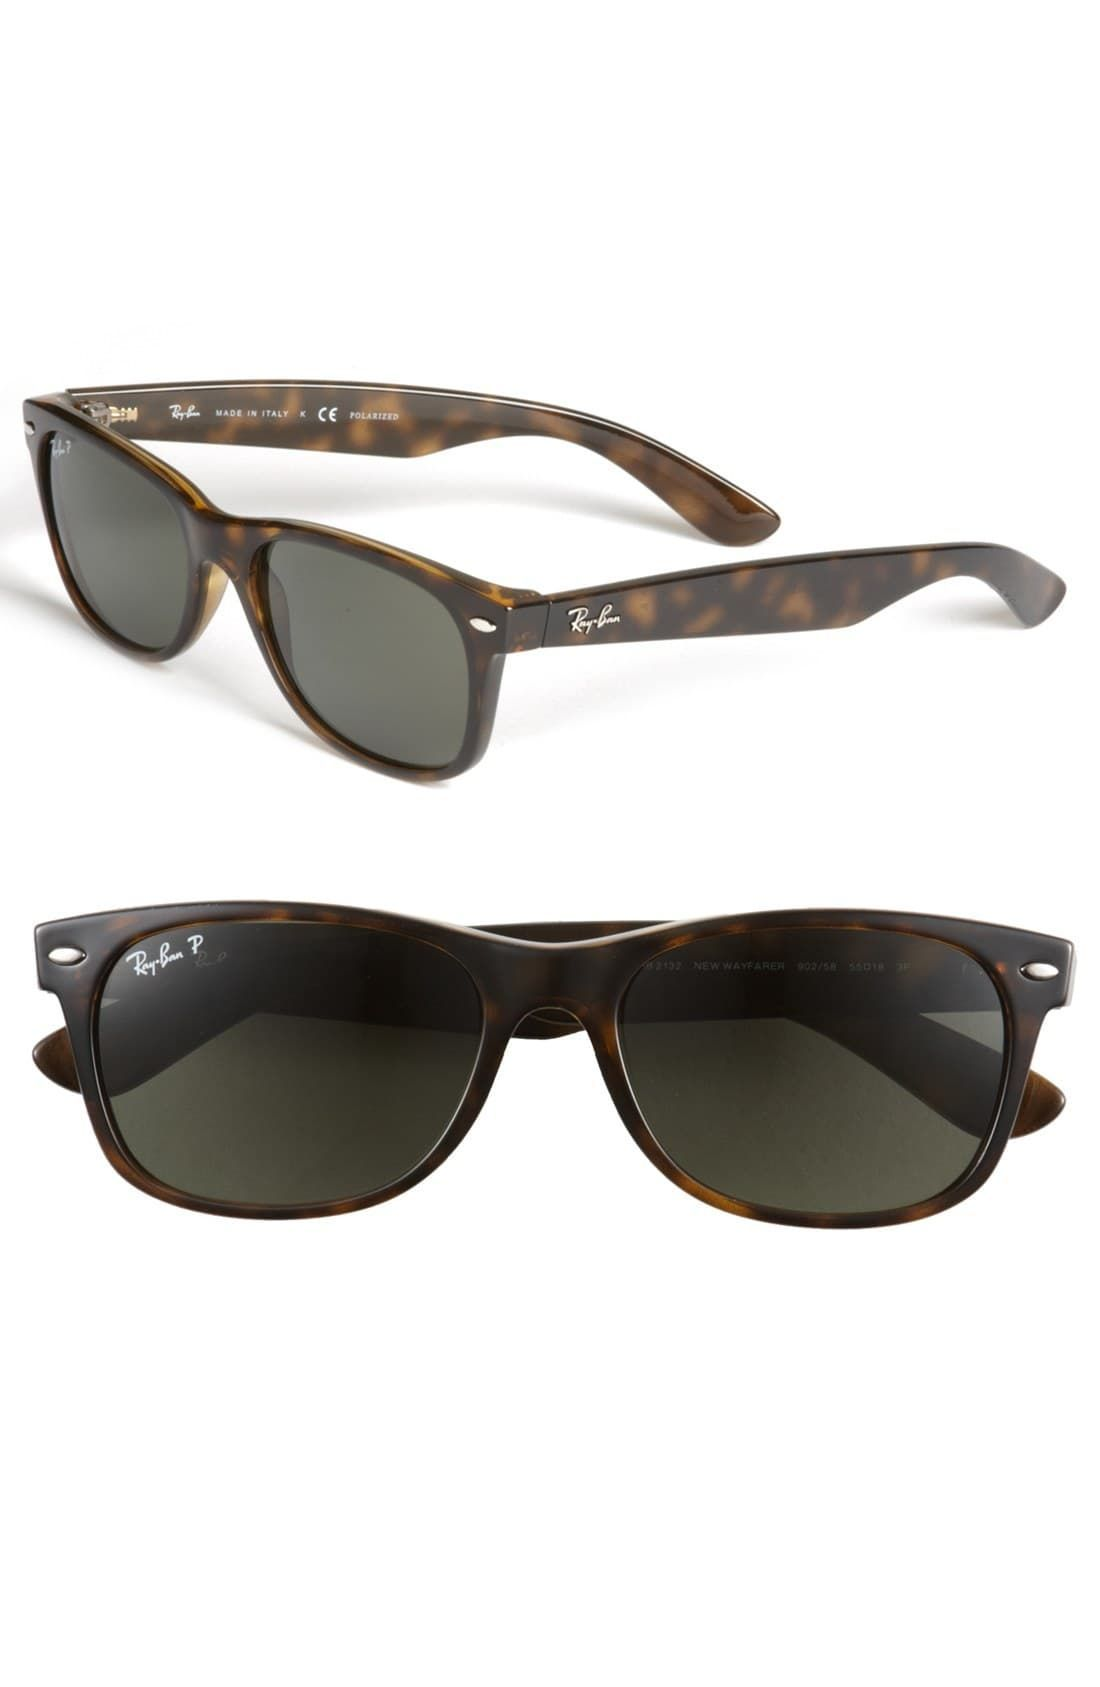 Mens Ray Ban New Wayfarer 55mm Polarized Sunglasses Matte Black Sunglasses Polarized Ray In 2020 Polarisierte Sonnenbrille Wayfarer Sonnenbrille Toms Shoes Outlet